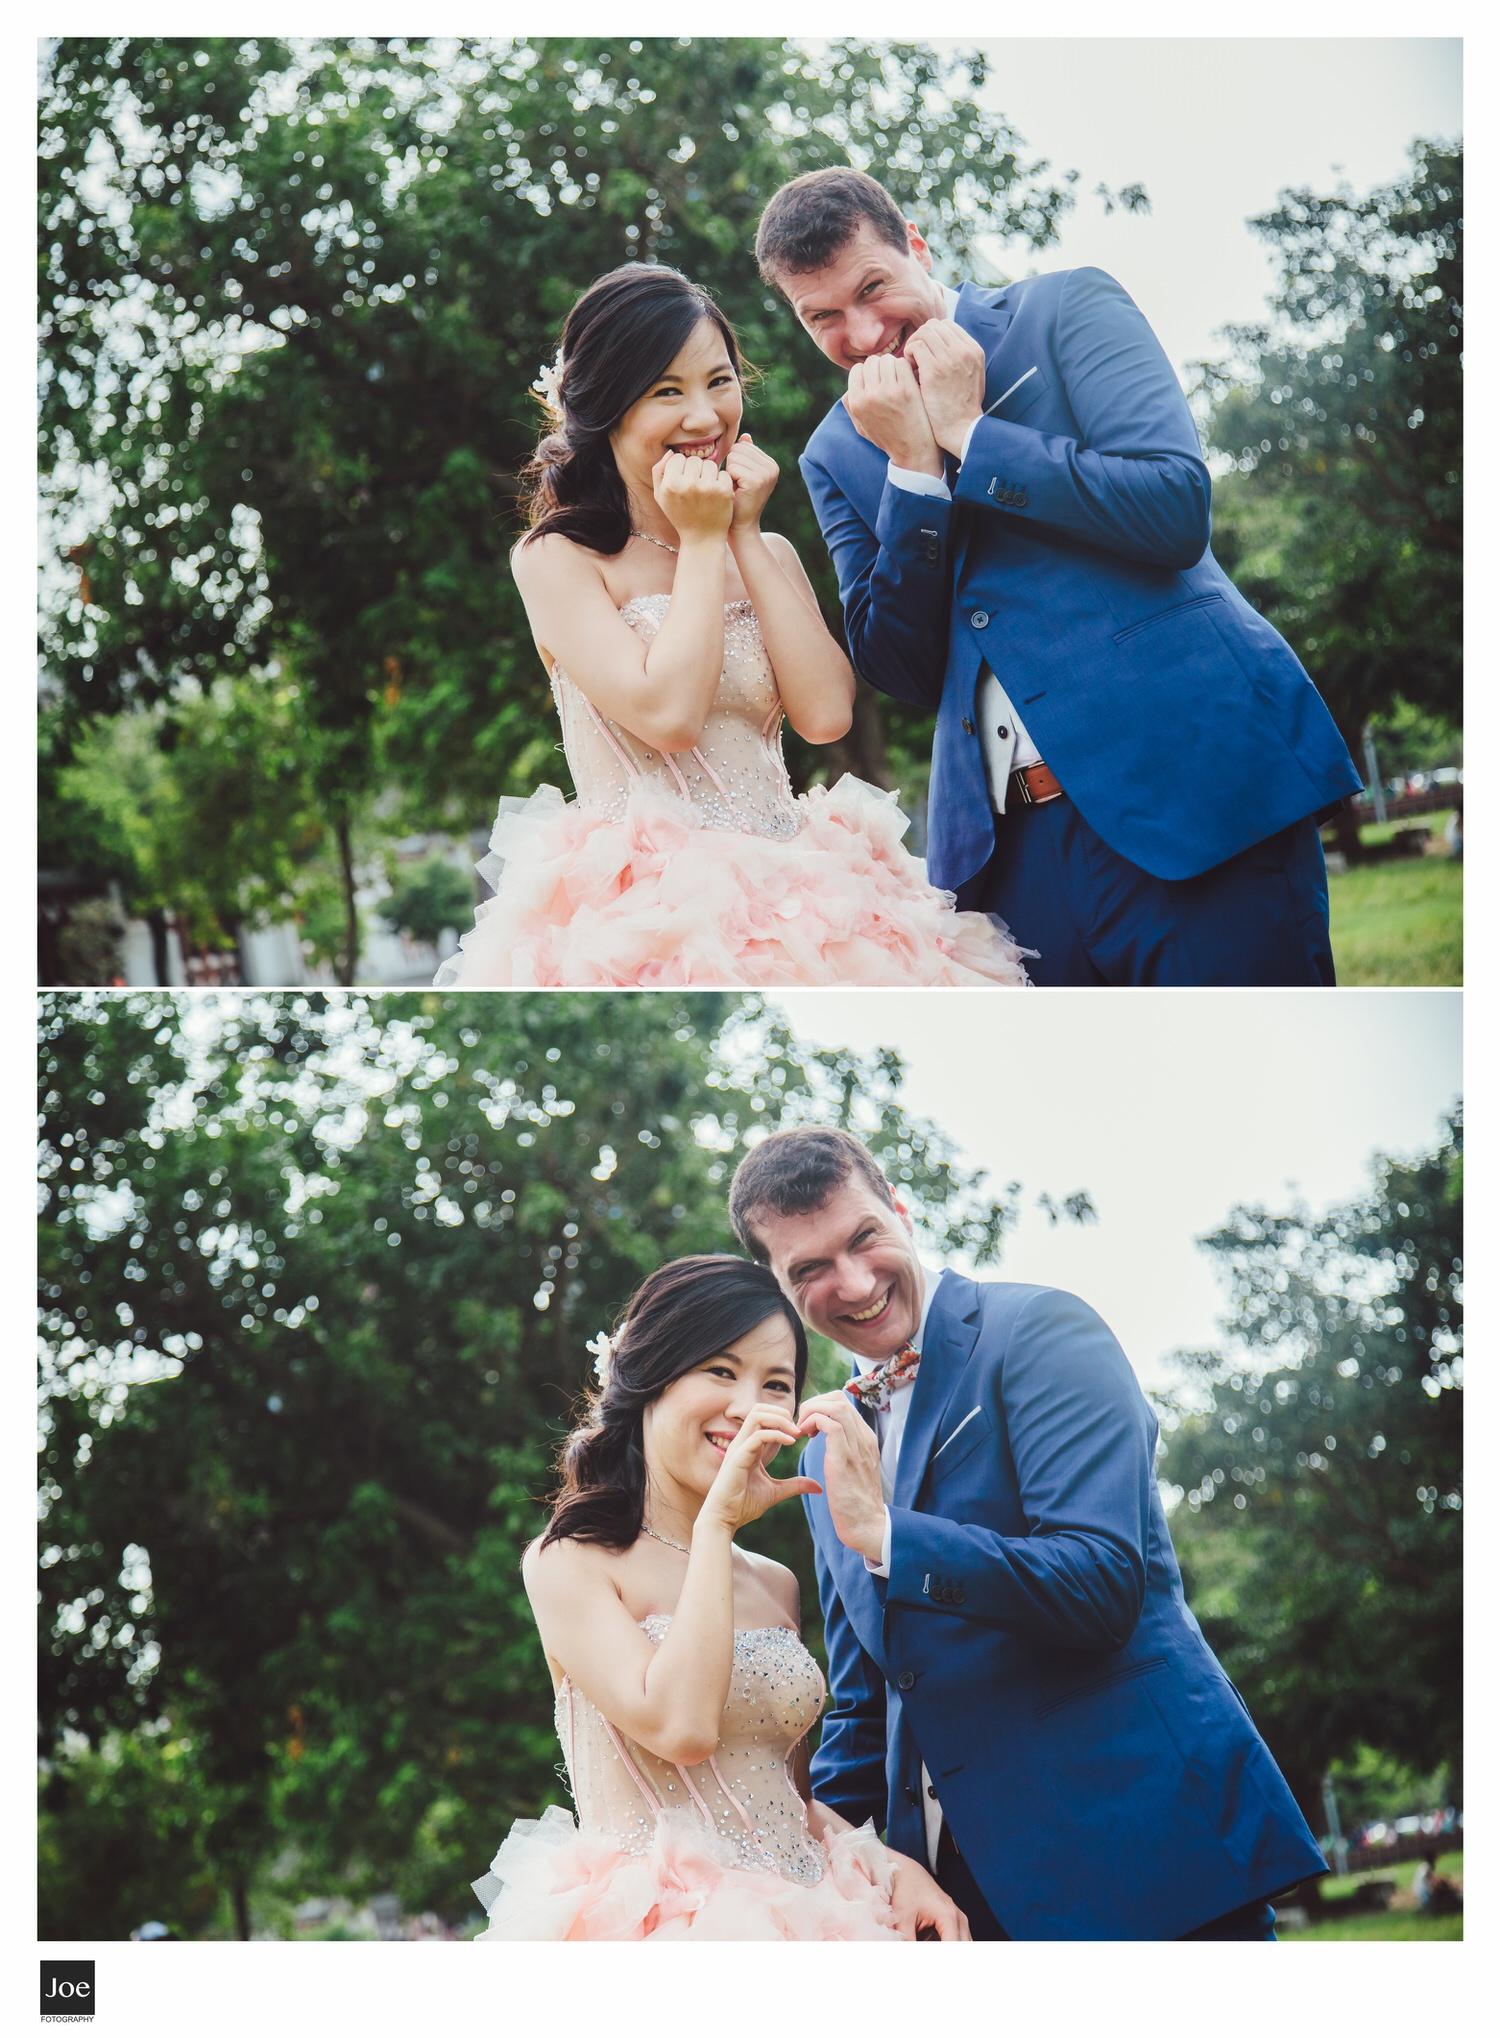 joe-fotography-pre-wedding-kay-jeff-037.jpg